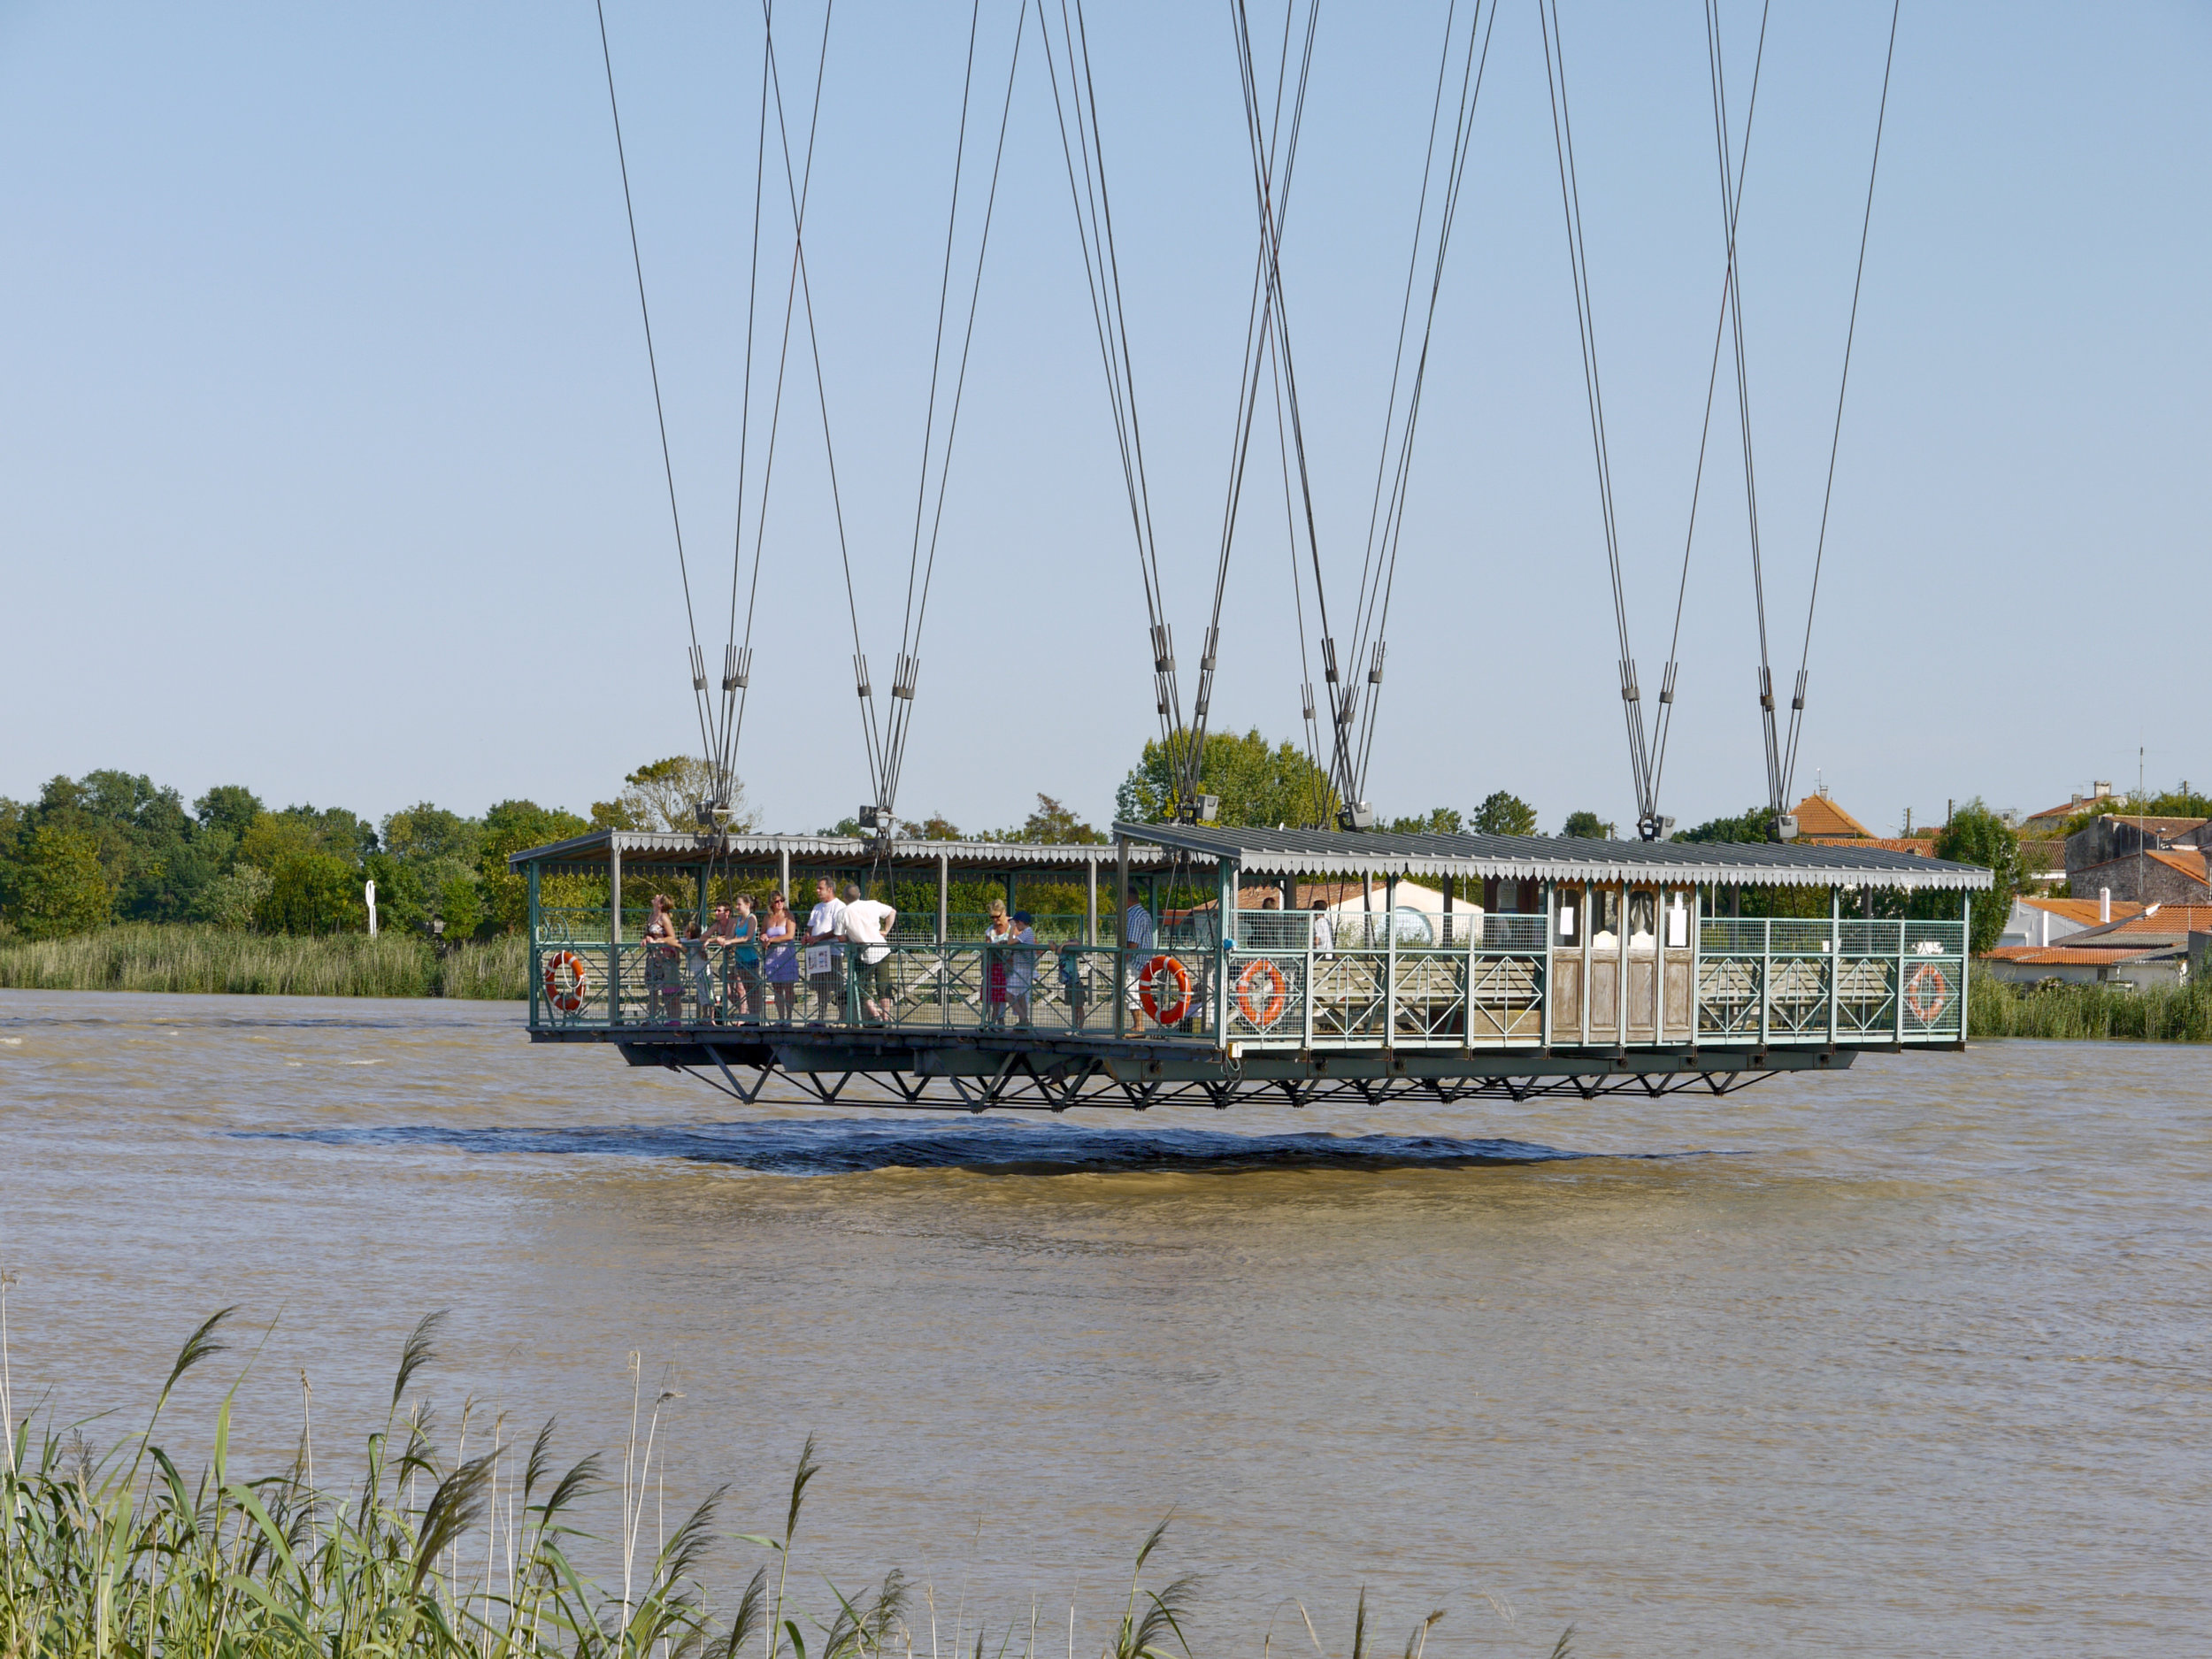 Rochefort Pont transbordeur. foto Xauxa (Håkan Svensson)